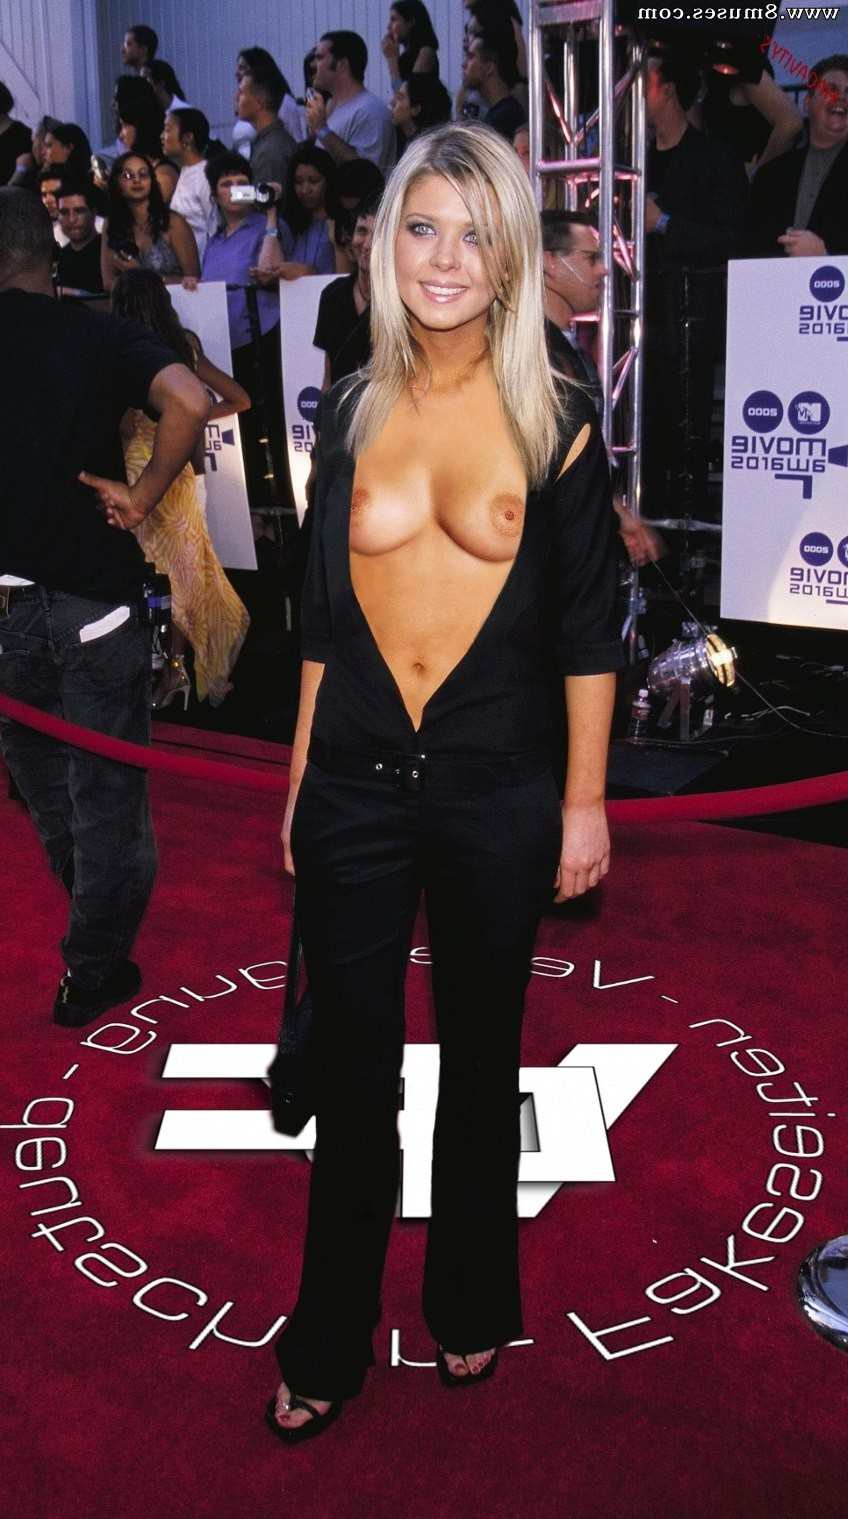 Fake-Celebrities-Sex-Pictures/Tara-Reid Tara_Reid__8muses_-_Sex_and_Porn_Comics_117.jpg